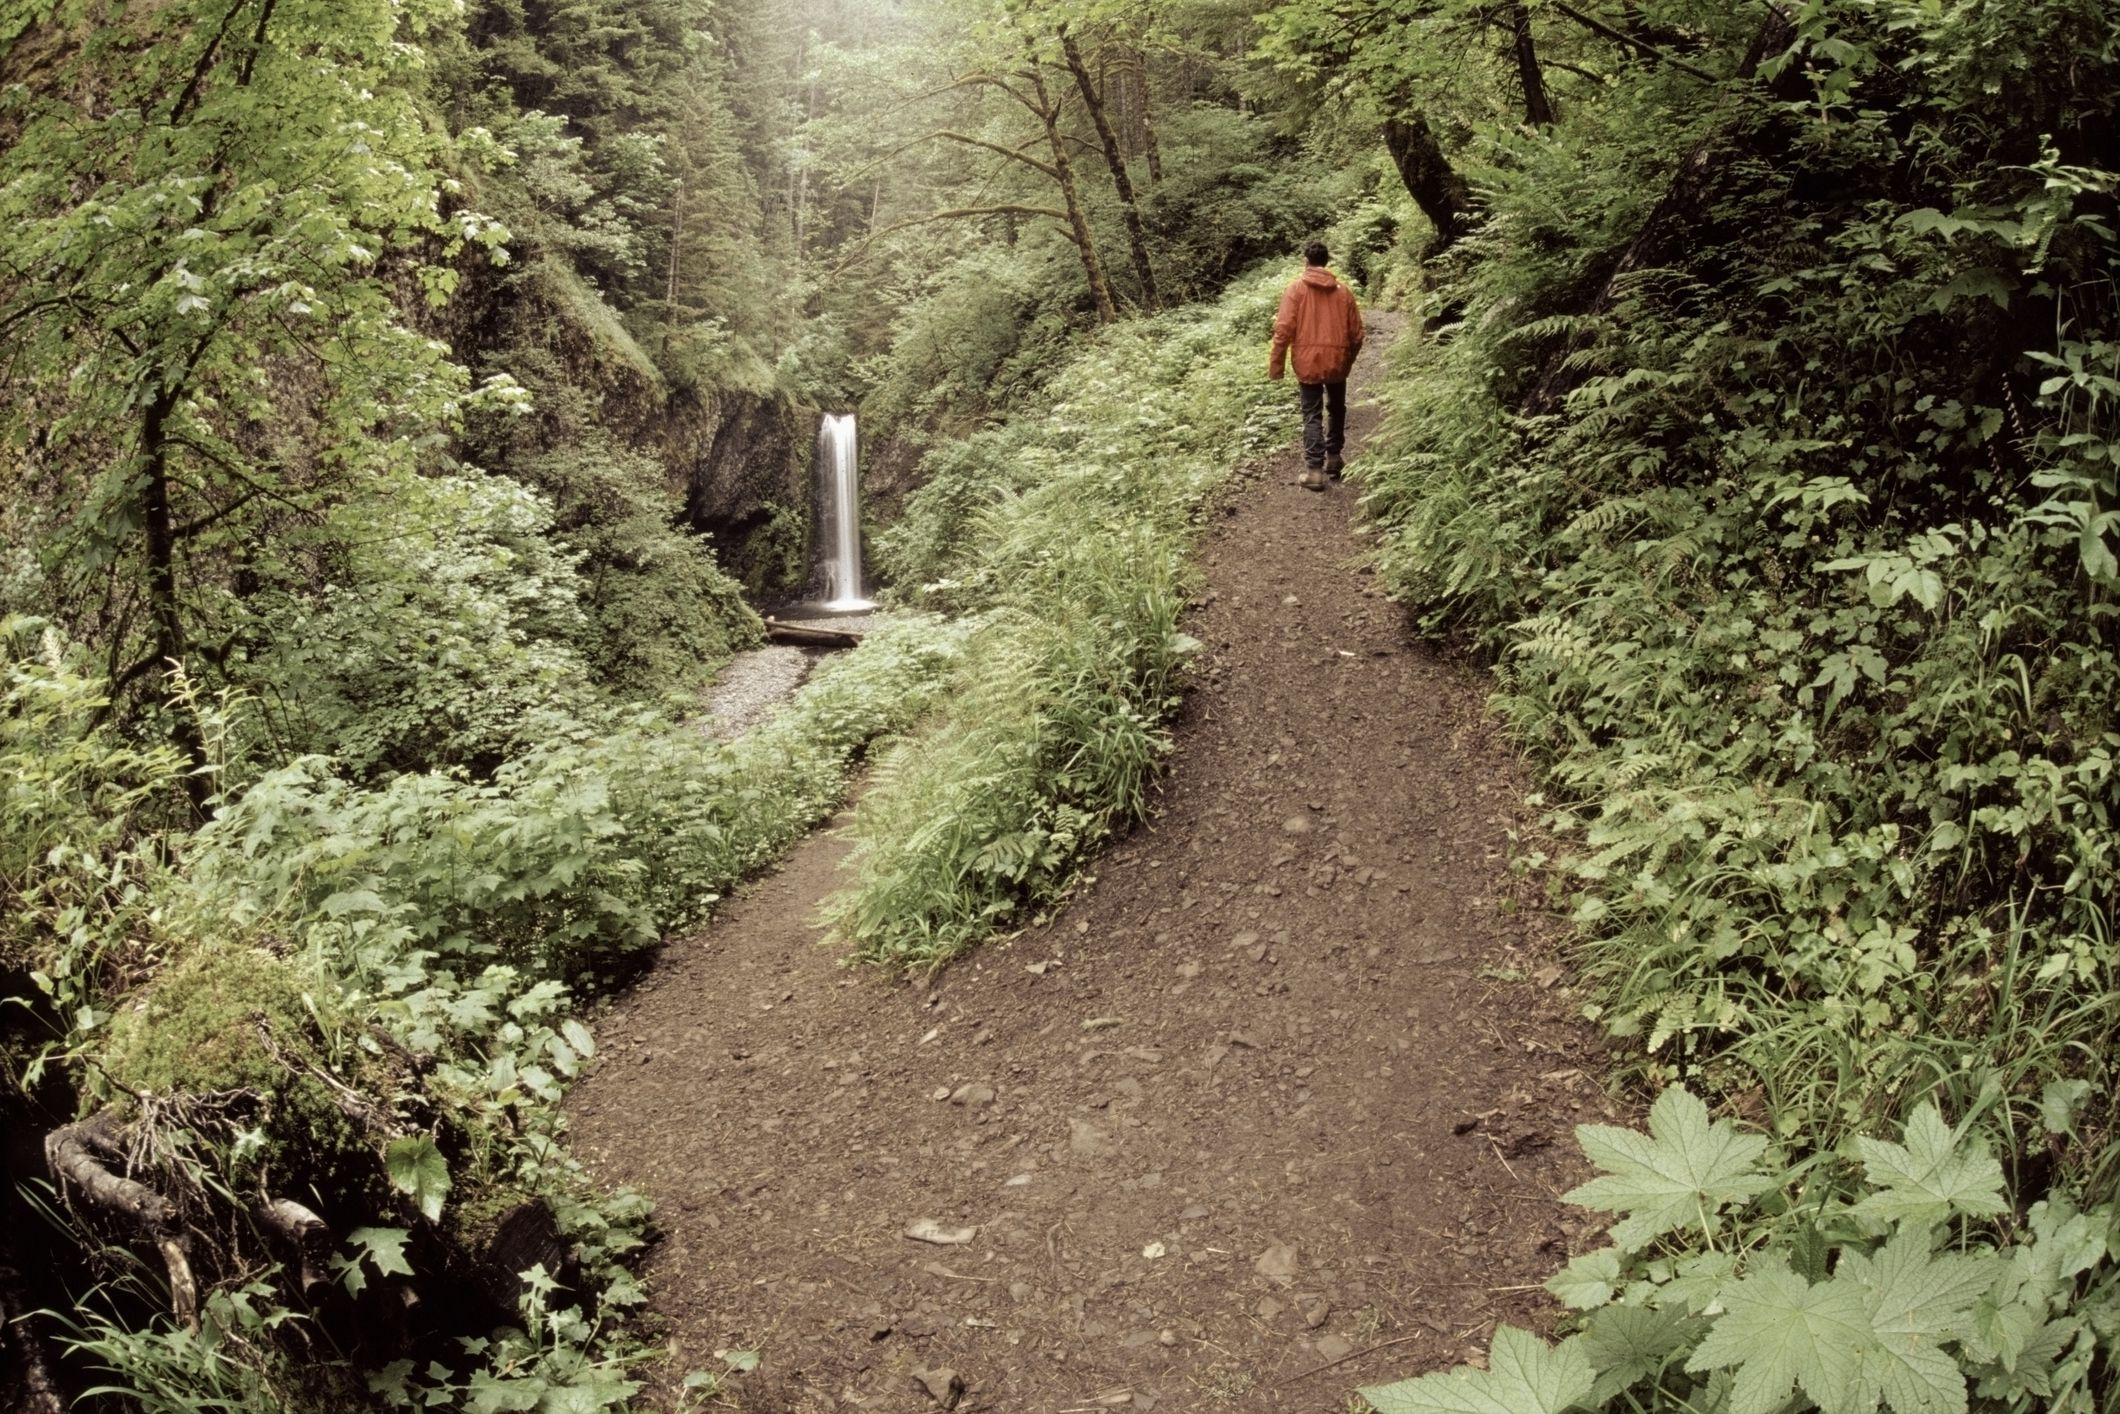 Serpintine Trail, Multnomah Creek, Columbia River Gorge, Oregon, USA